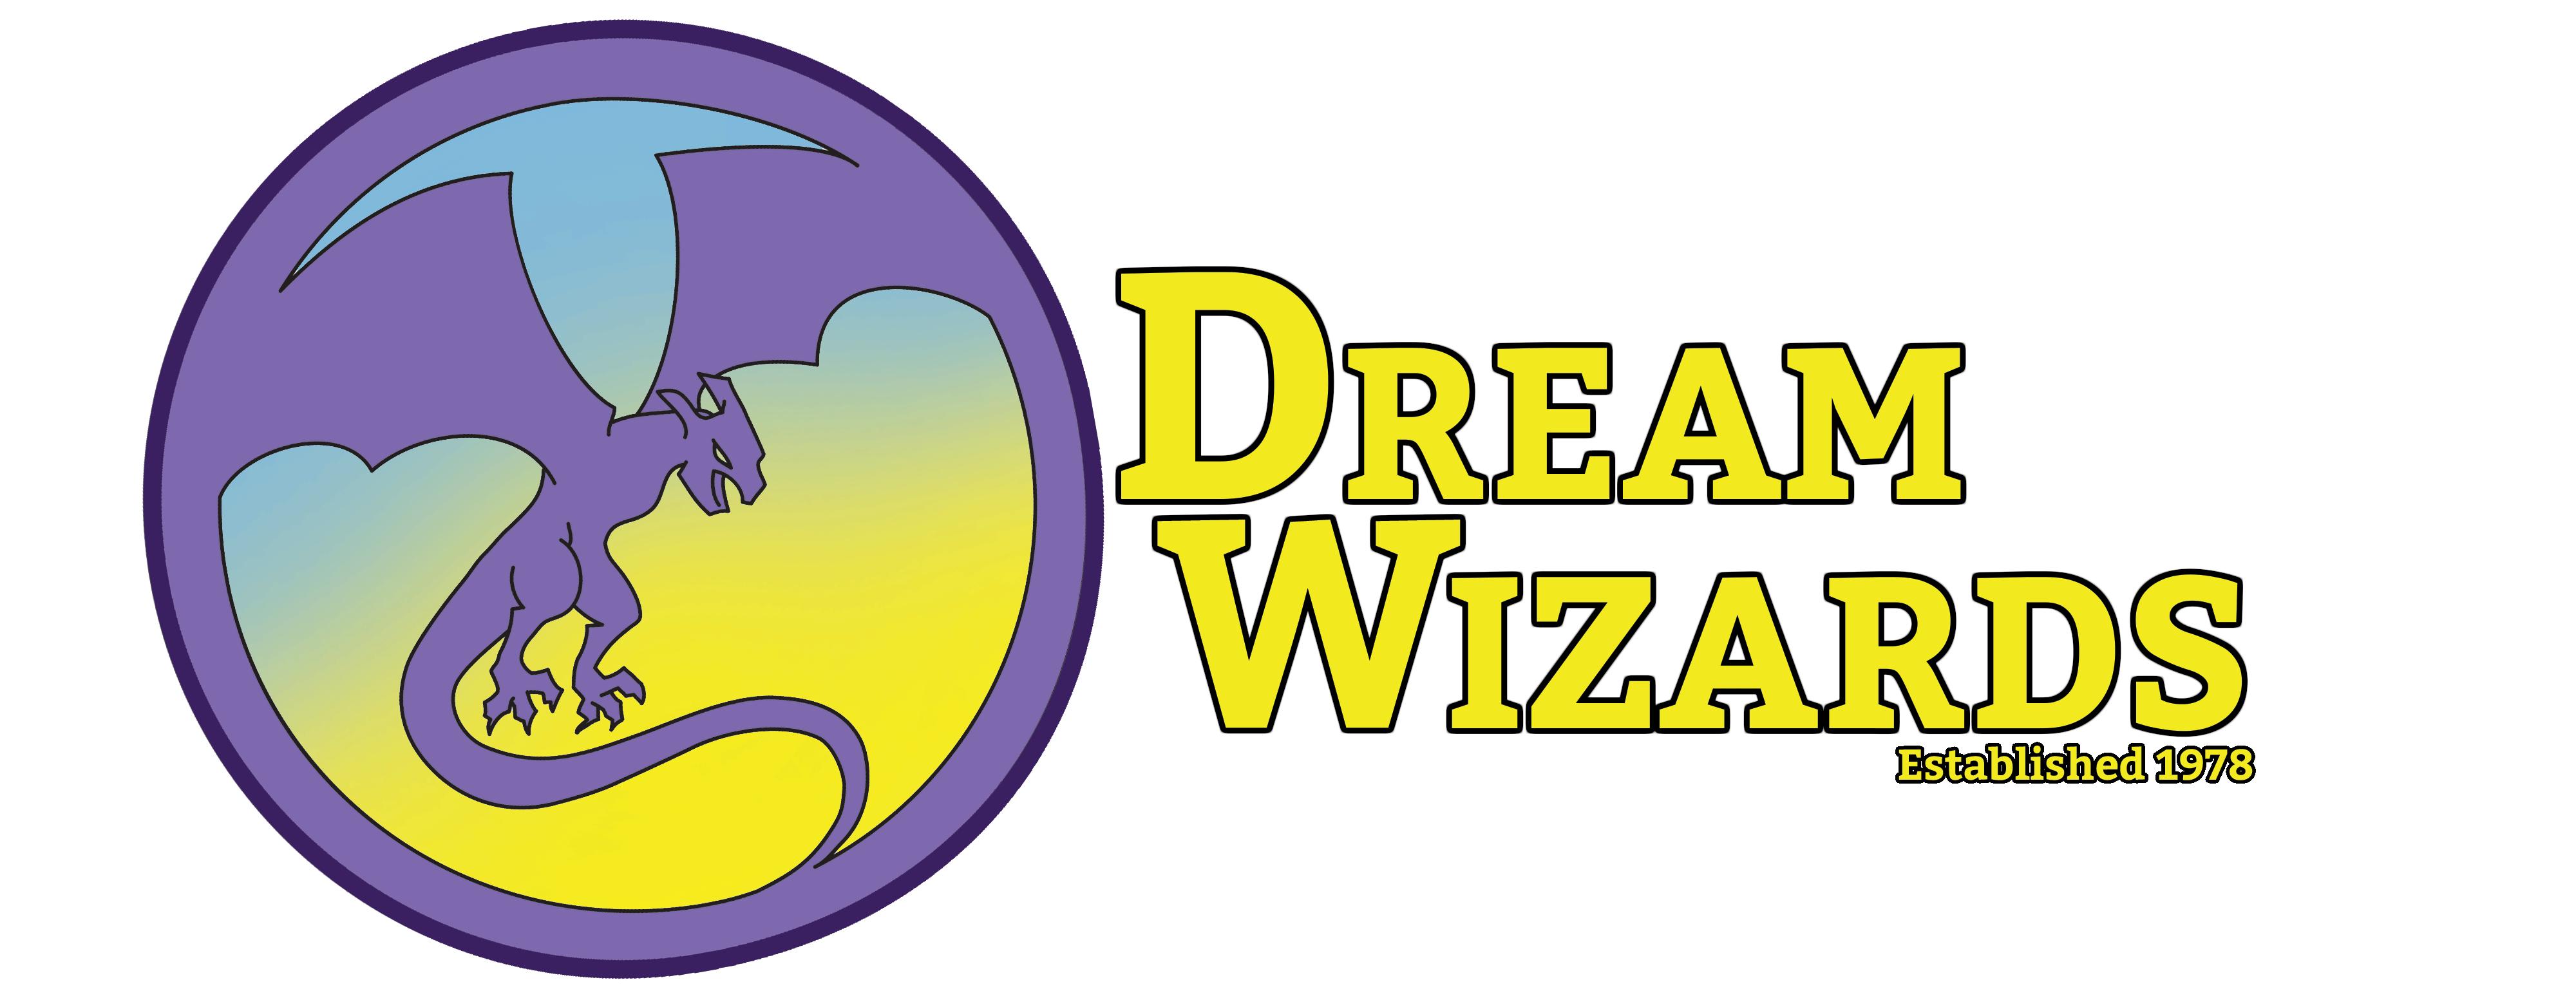 Dreaming clipart scenario Dream Wizards Banner